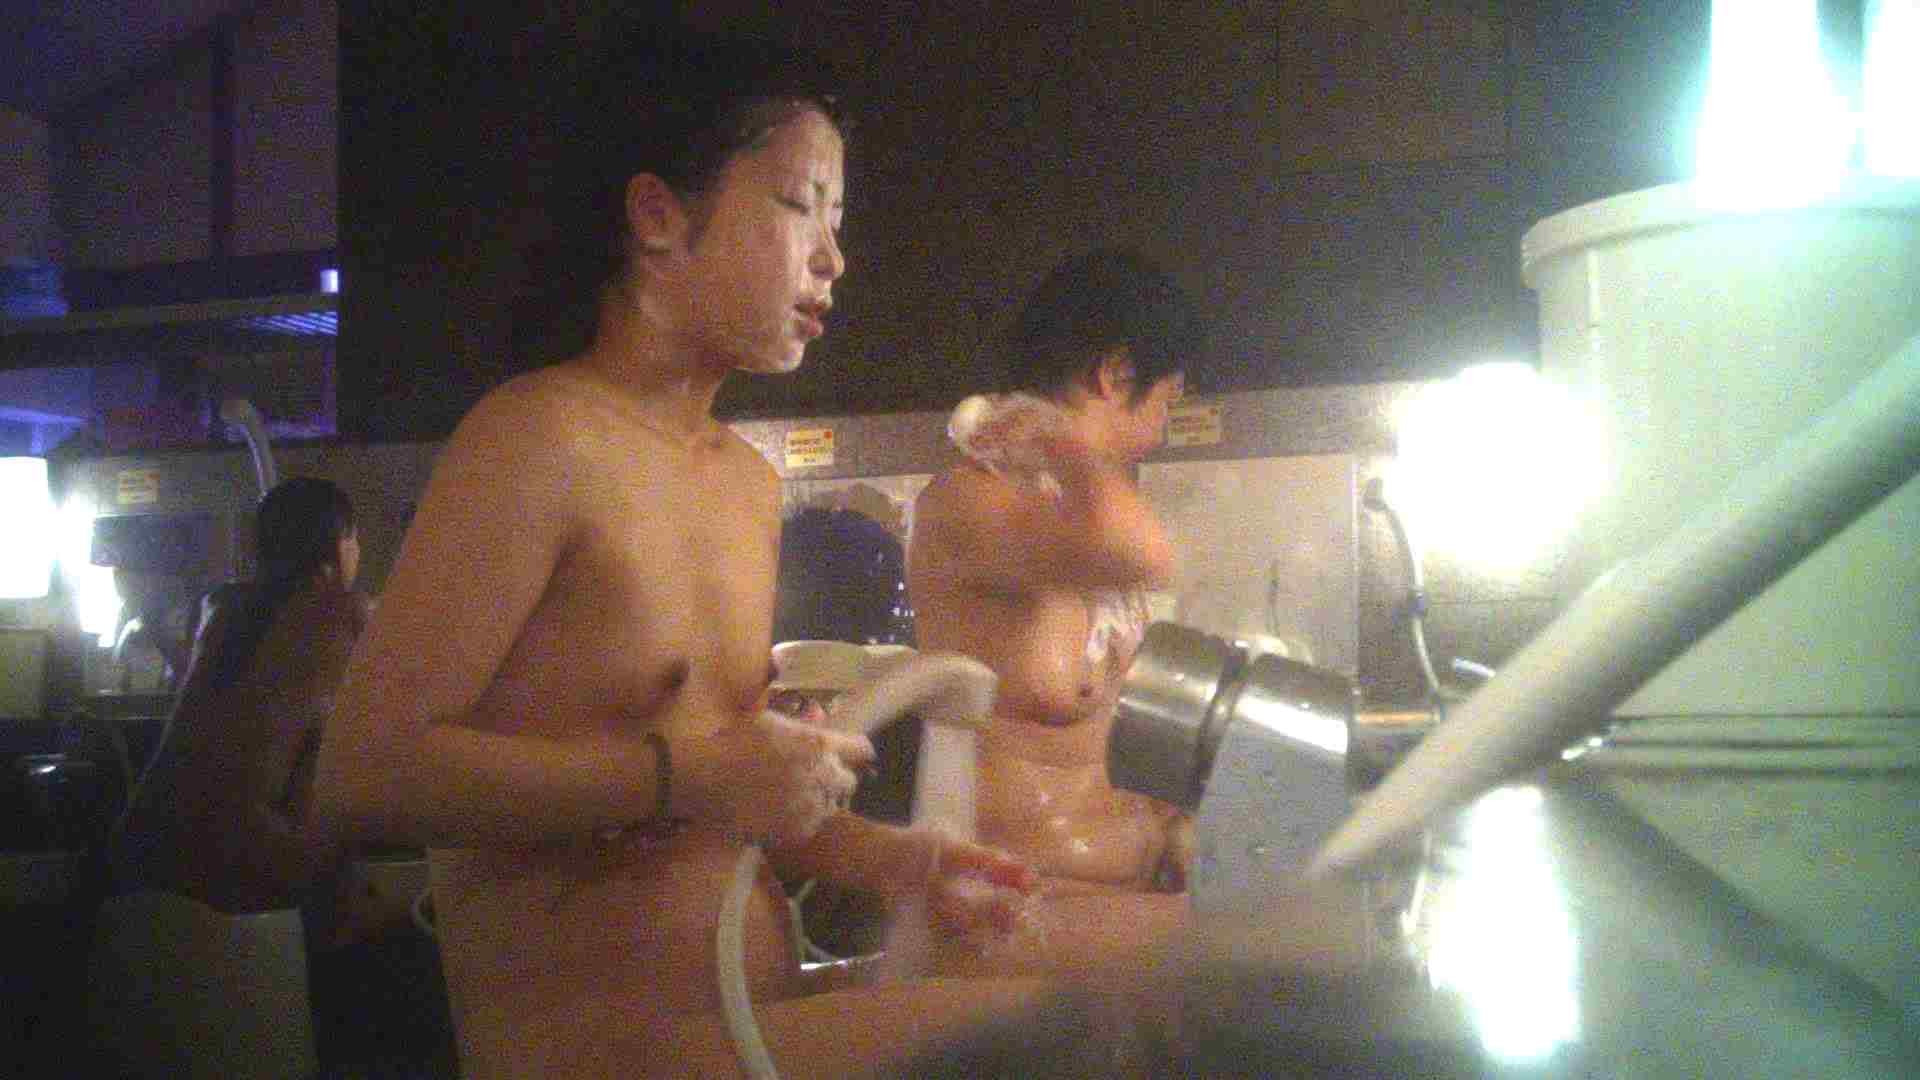 TG.01 【上等兵】お上品な女子大生の少し小さな胸をどうぞ 女湯 AV動画キャプチャ 66画像 46